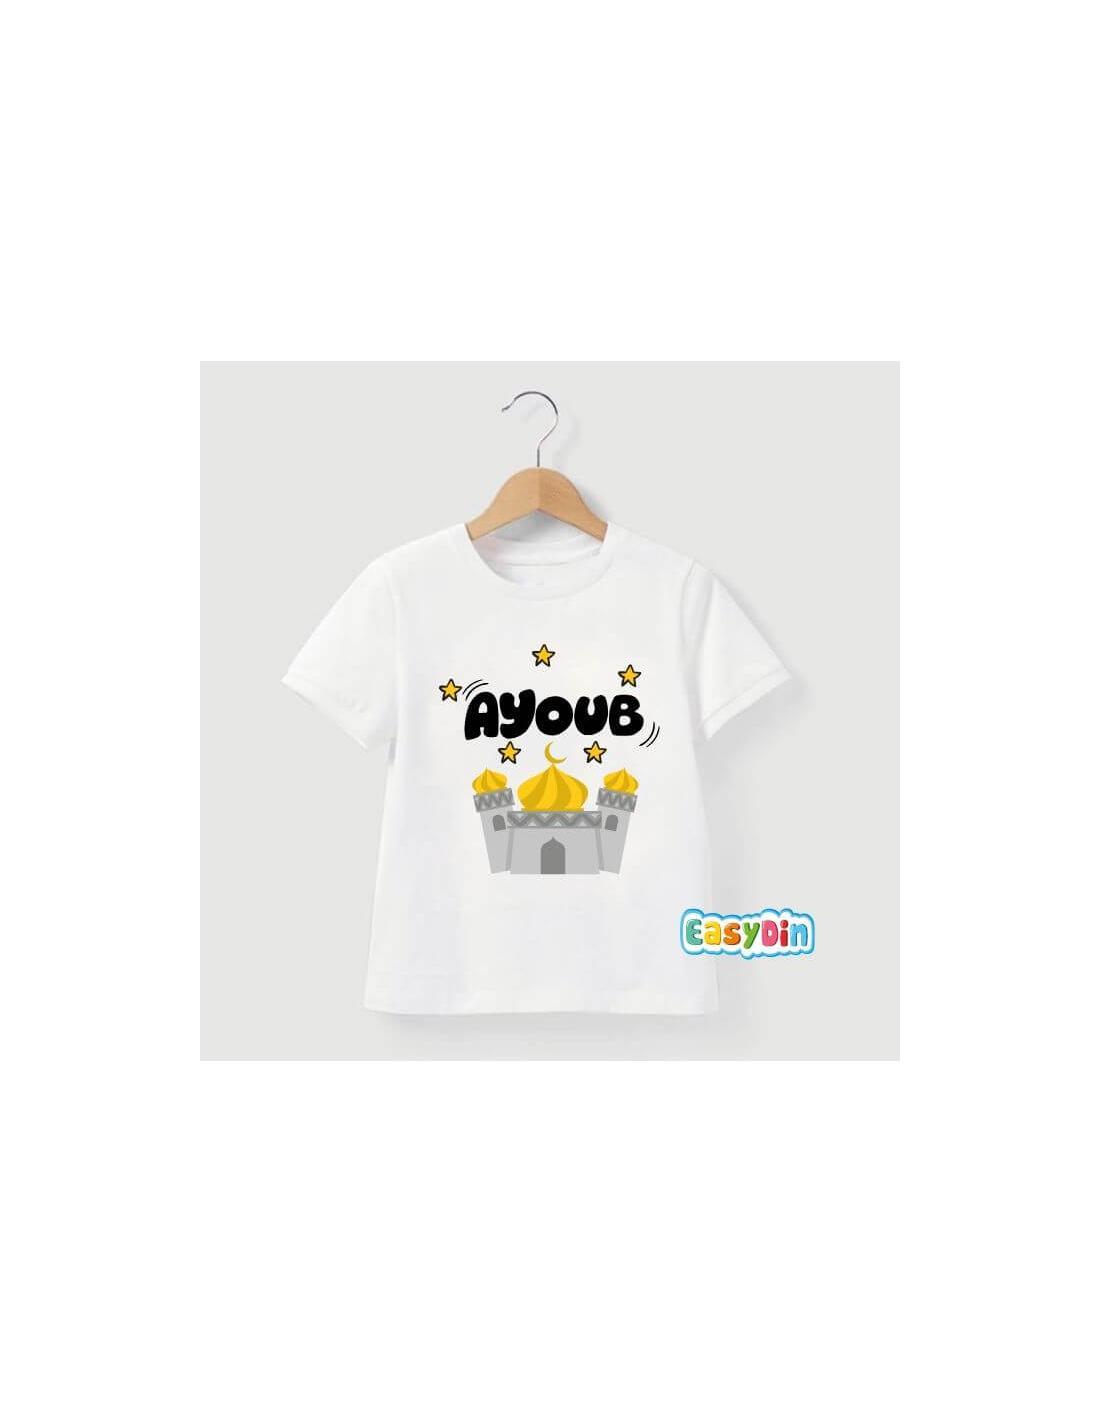 ... shirt personnalisé masjid Tee-shirt manches courtes personnalis